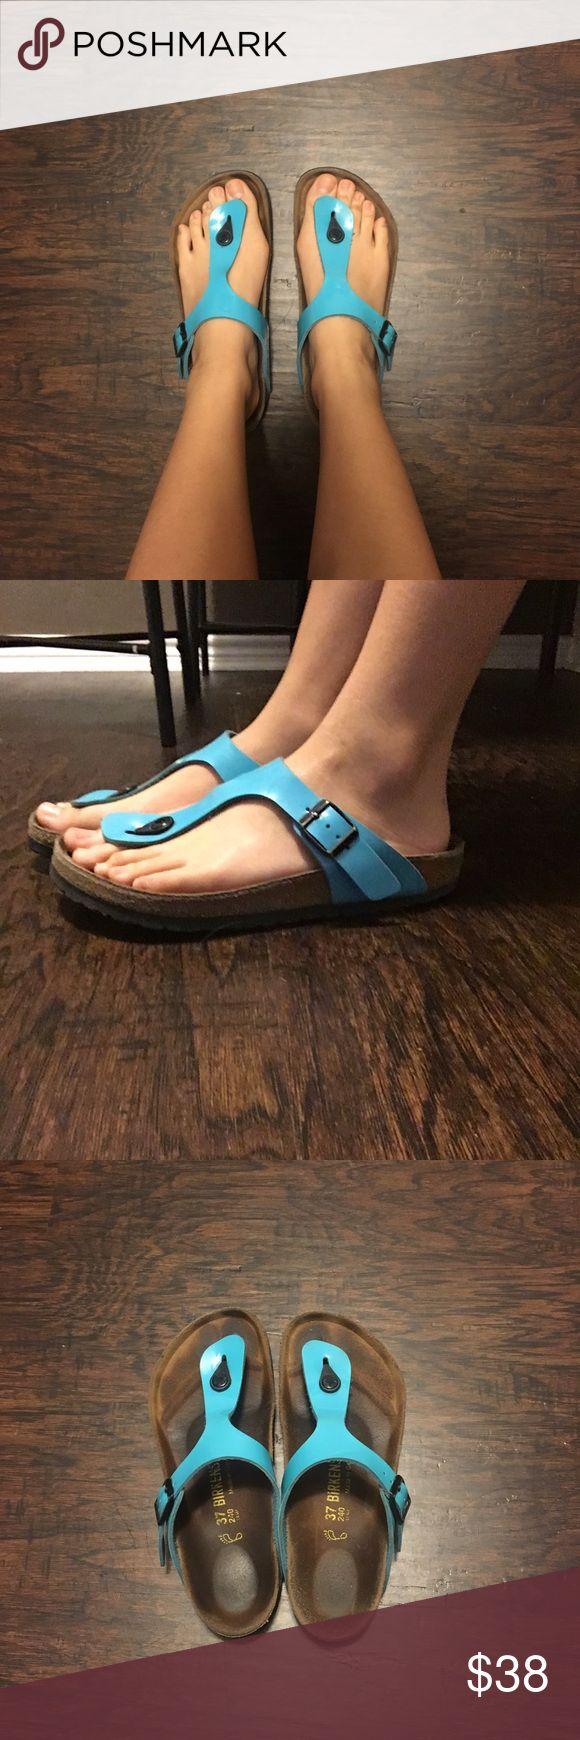 Birkenstock slipper Bright blue Birkenstock Birkenstock Shoes Slippers